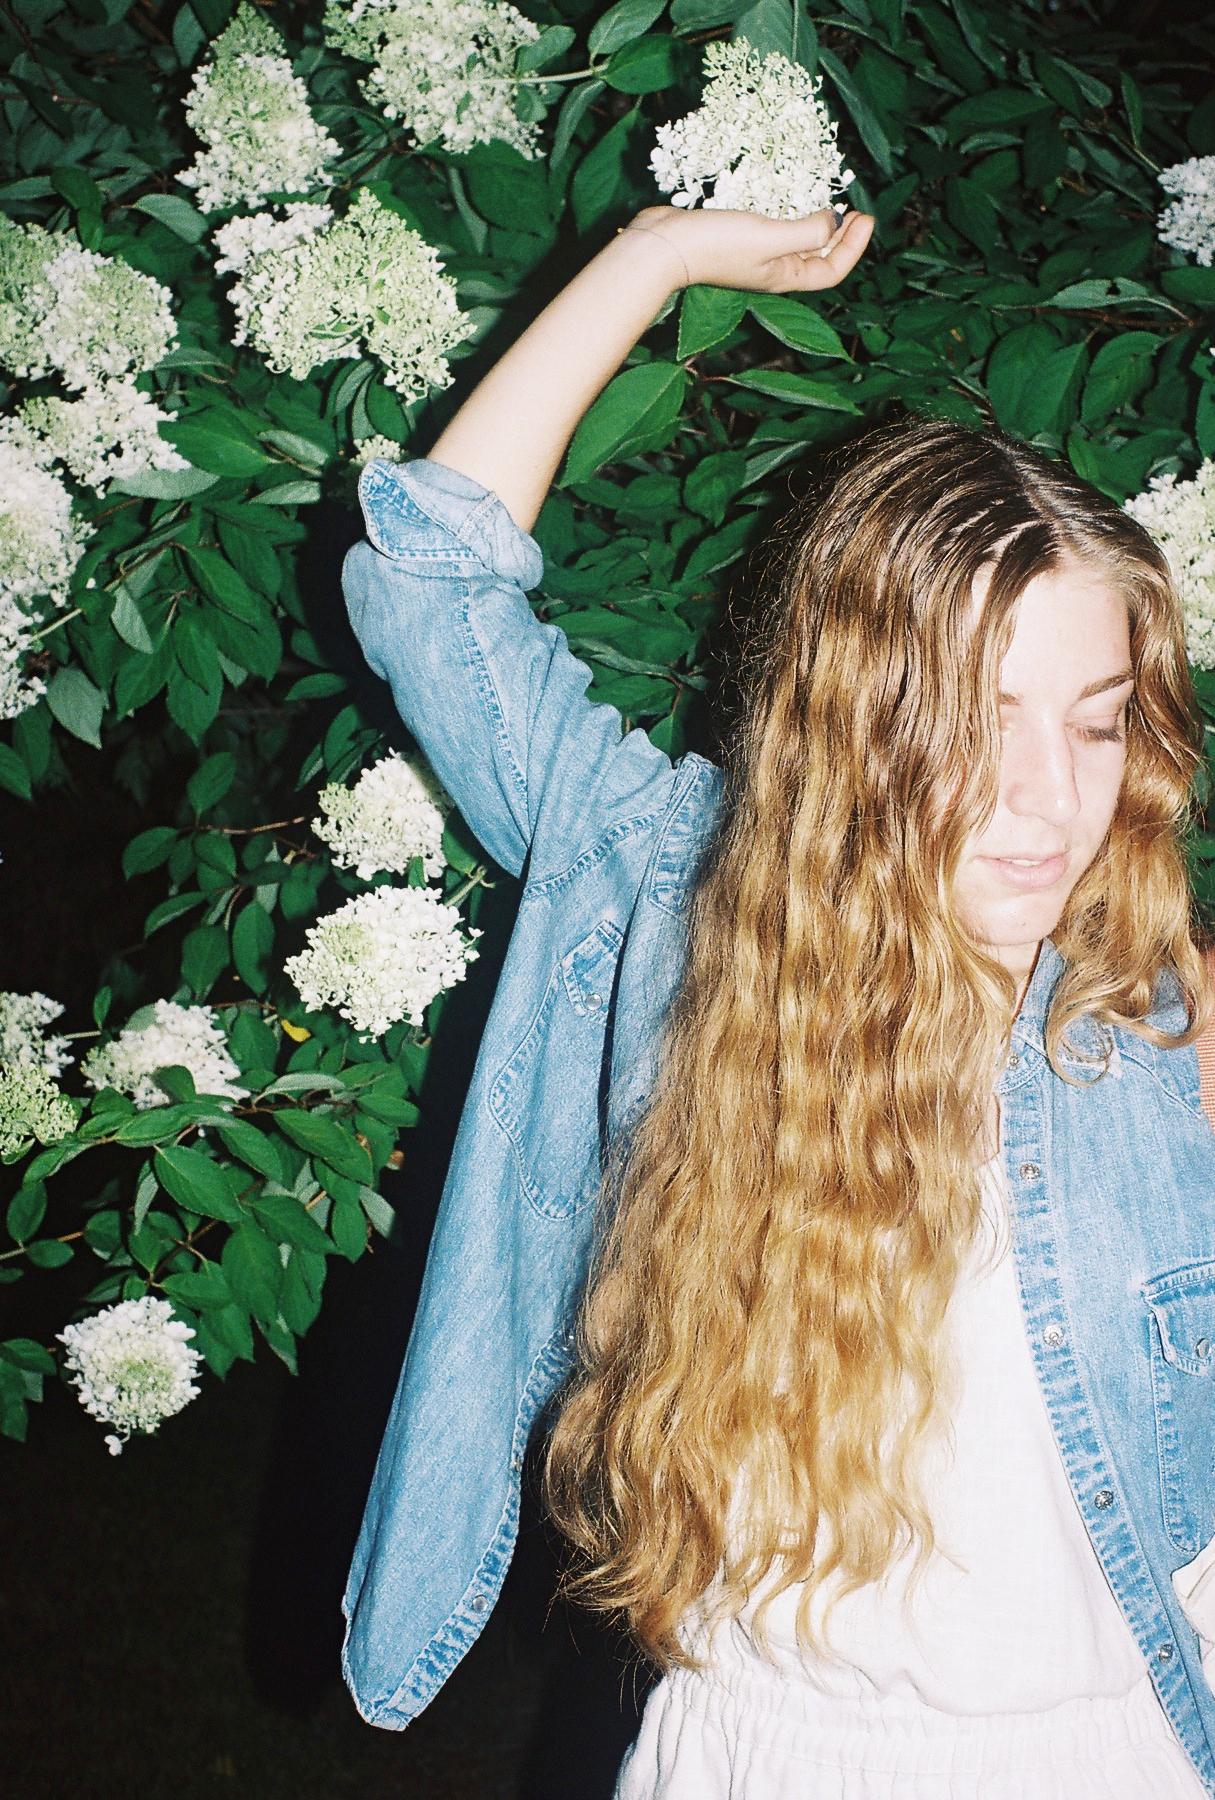 Emma's Pre-Raphaelite hair.